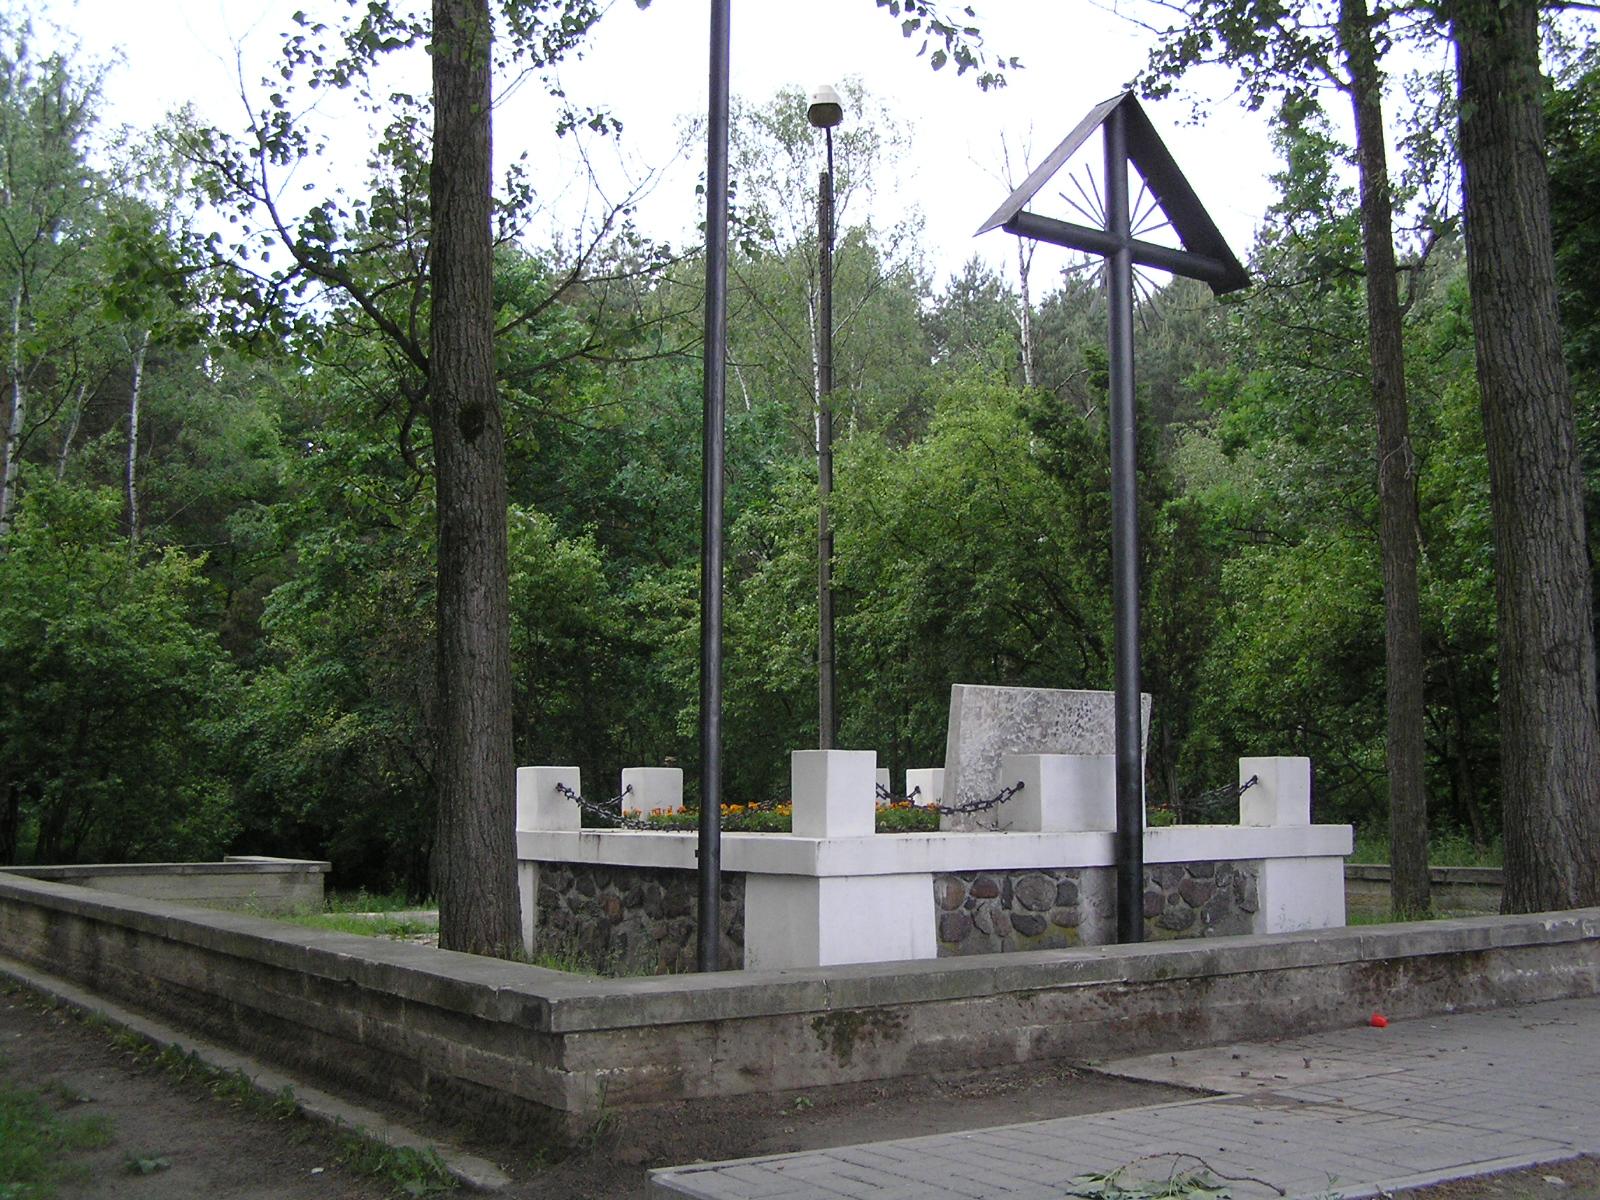 Harcerski Rajd - Olszynka Grochowska